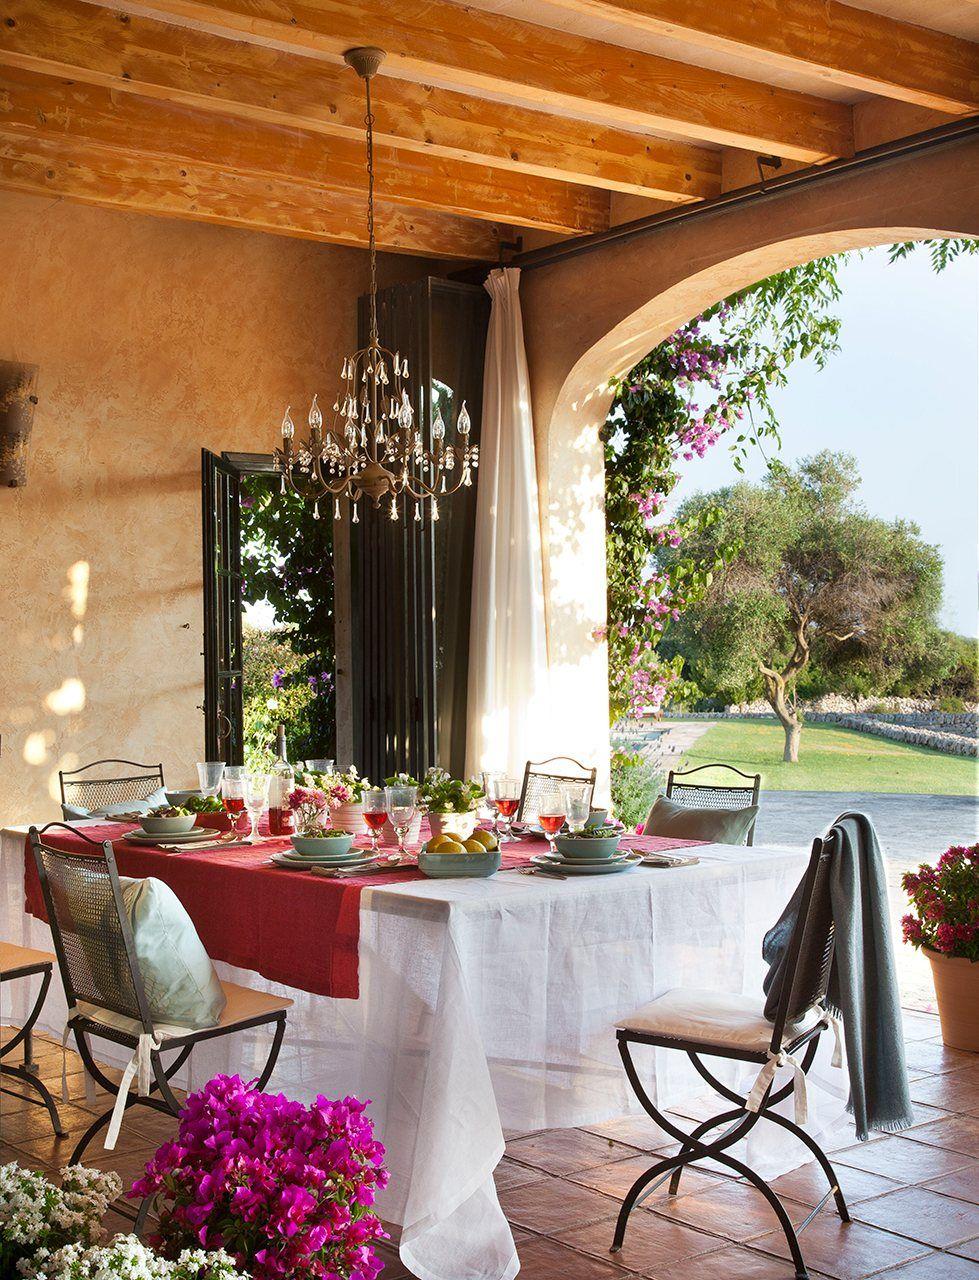 4 comedores de verano para inspirarte for Comedores de terraza chile